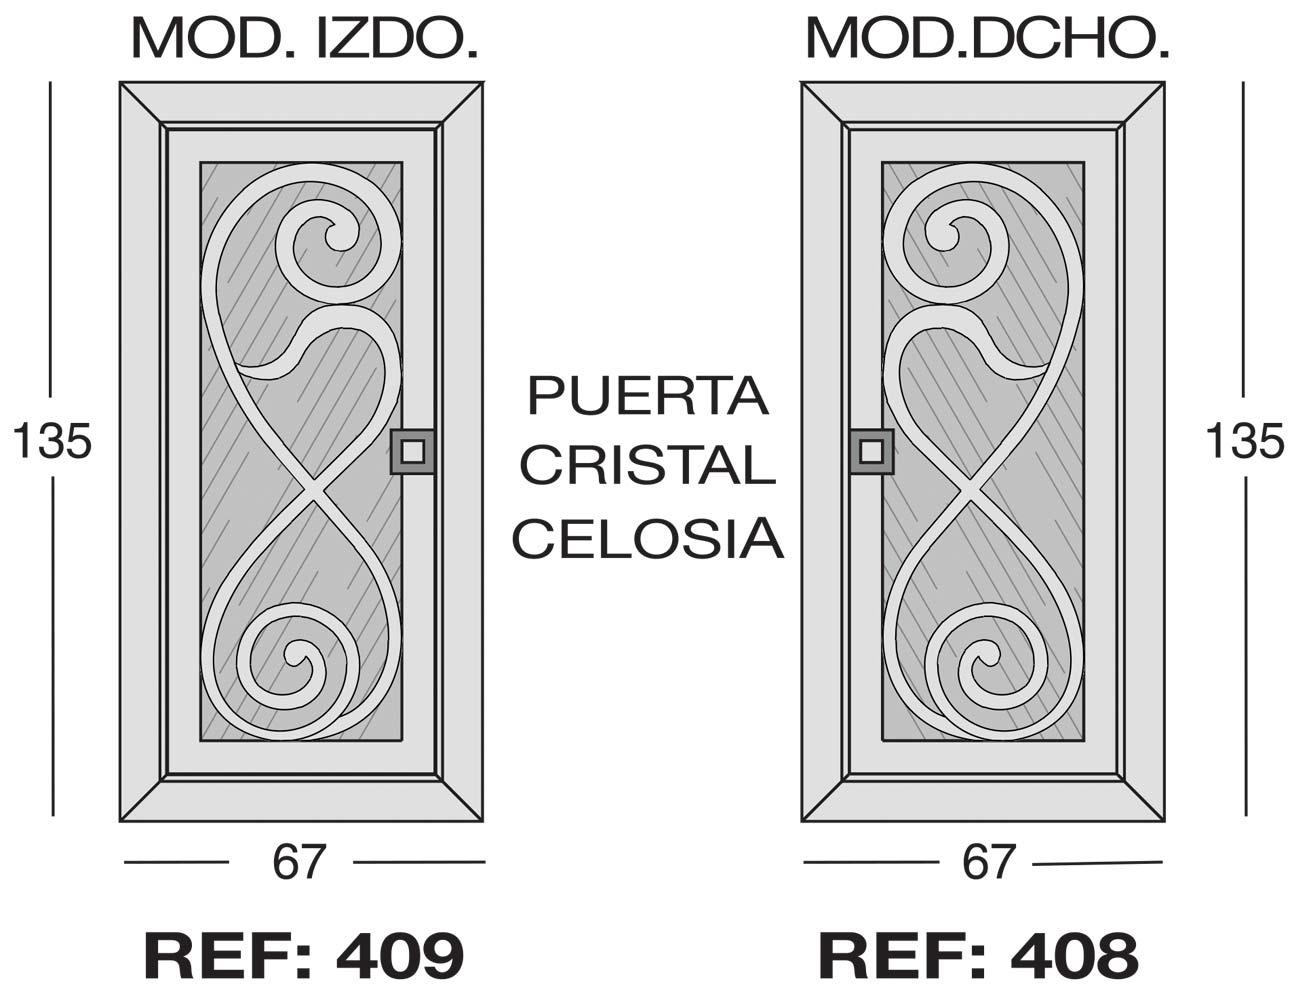 Modulo izdo 409 dcho 408 puerta cristal celosia1